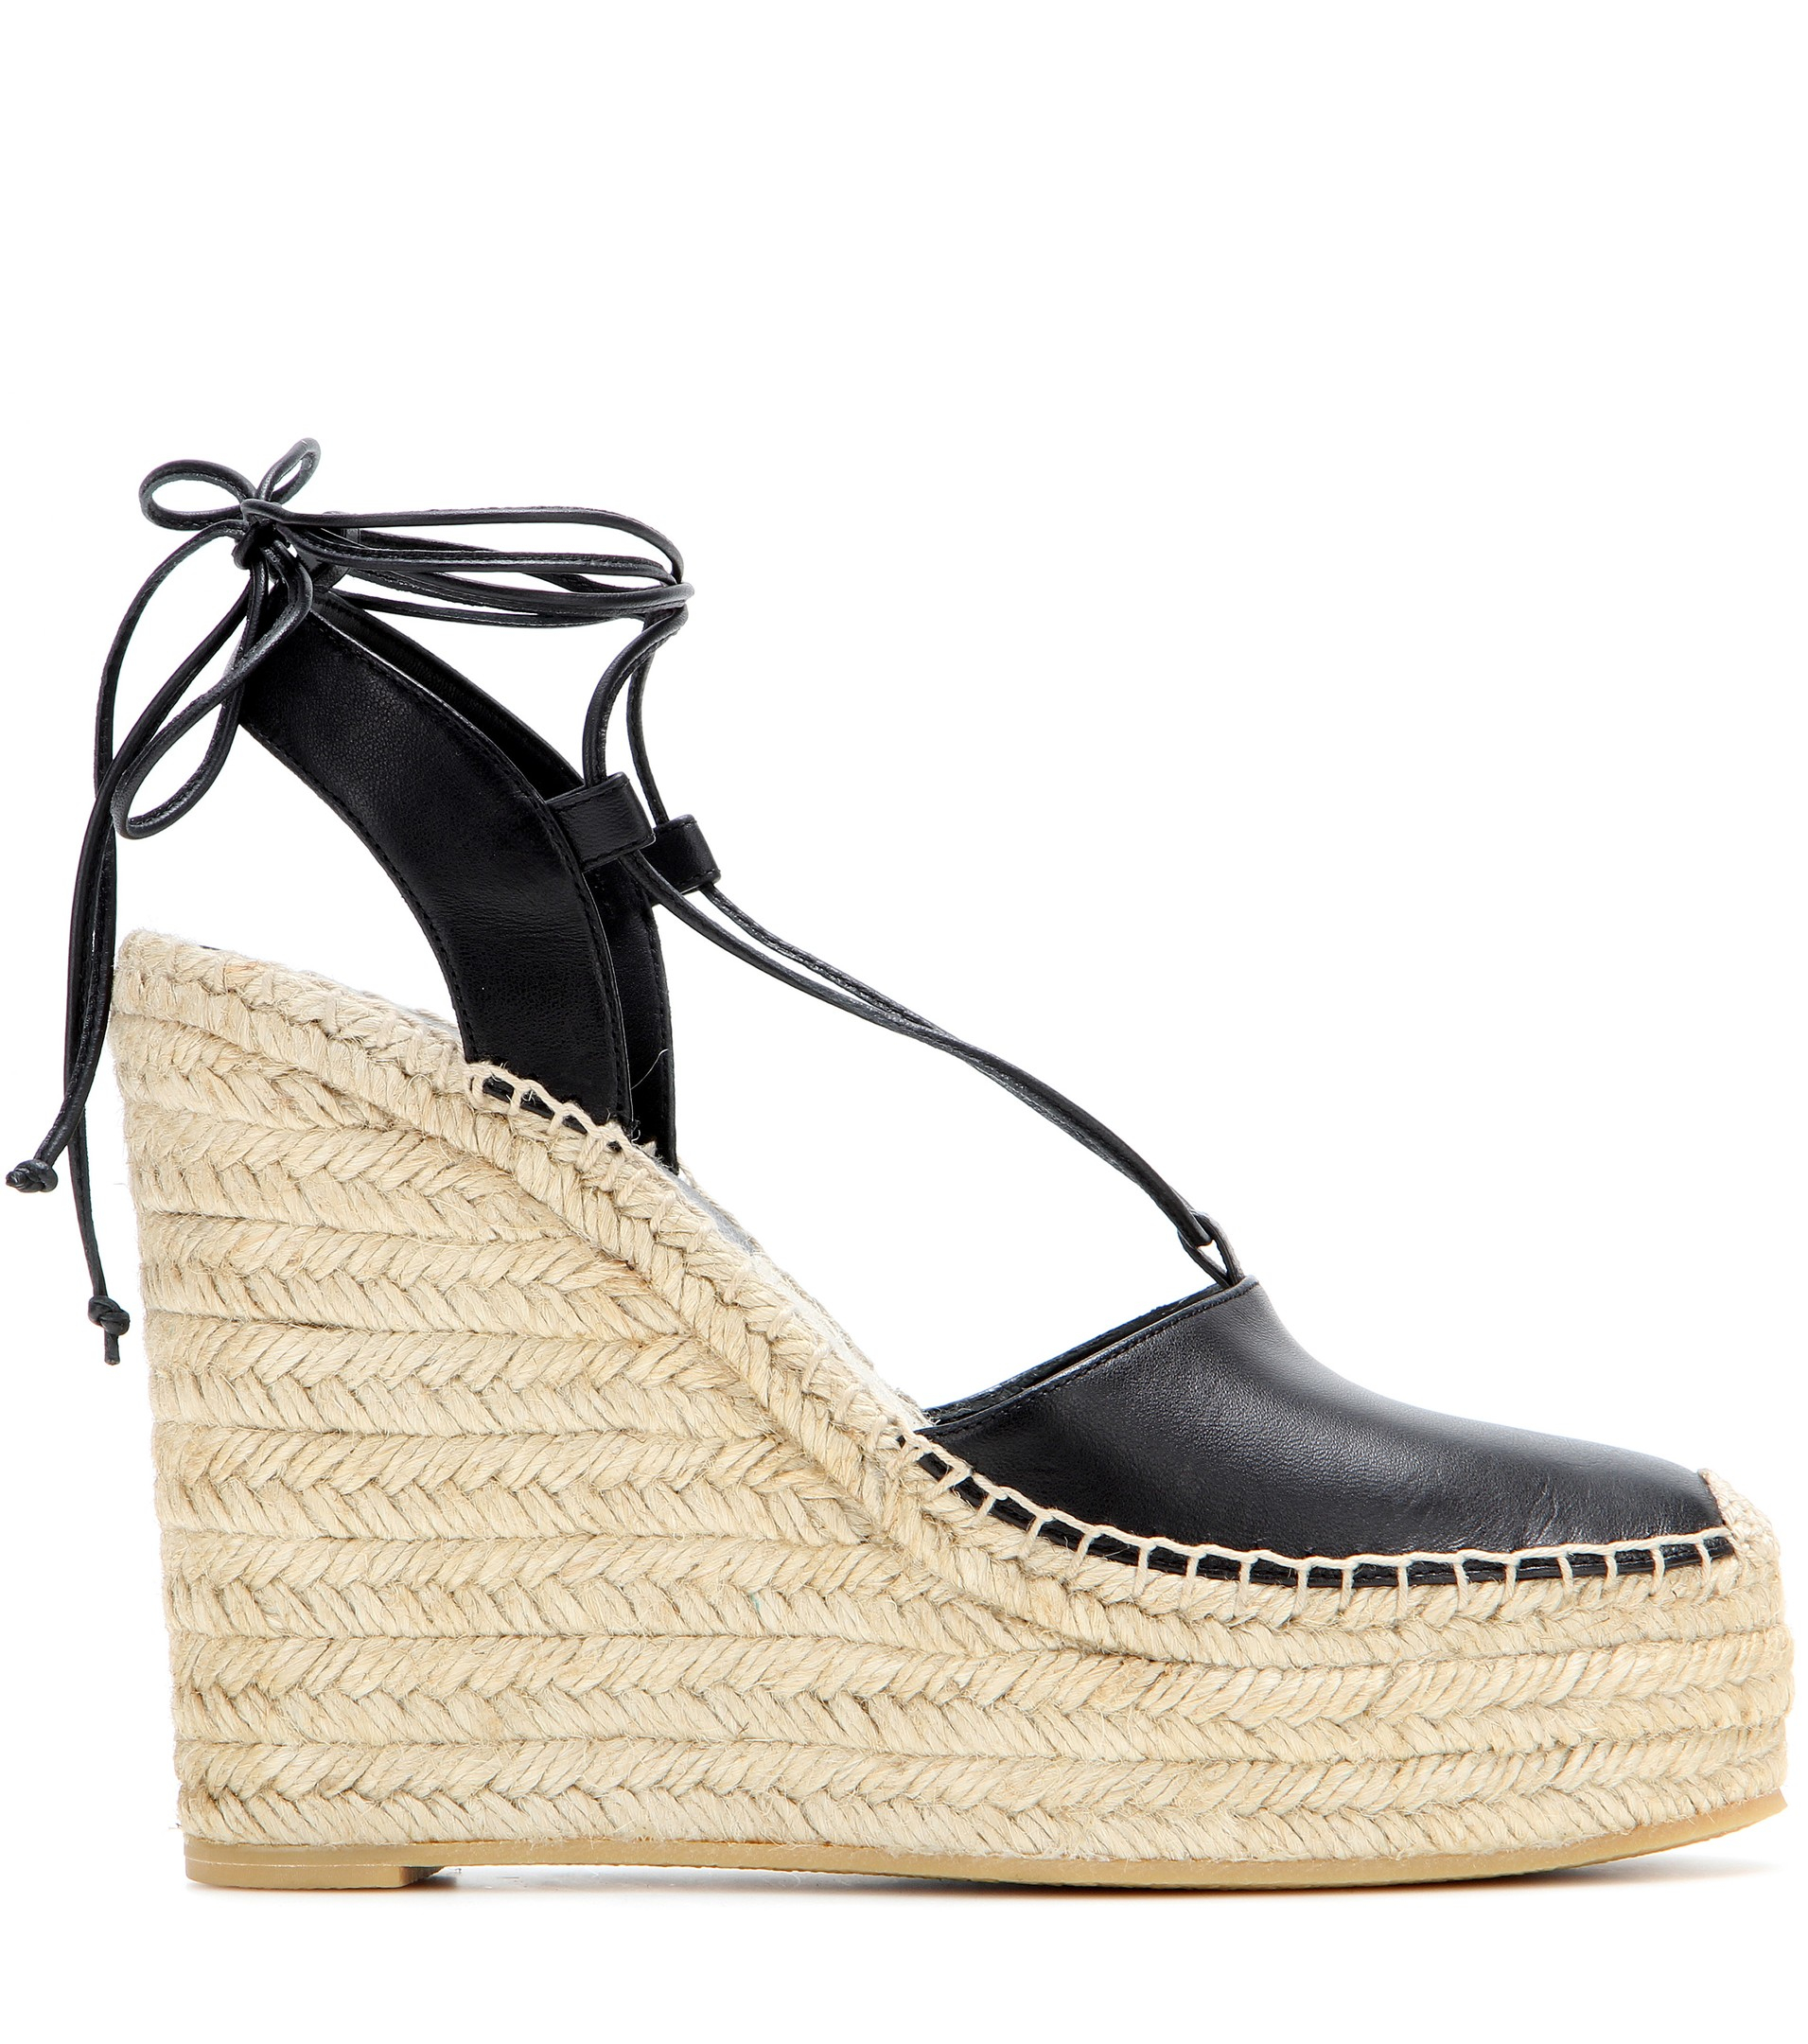 1dd58a8d322 Saint Laurent Leather Espadrille Wedge Sandals in Natural - Lyst